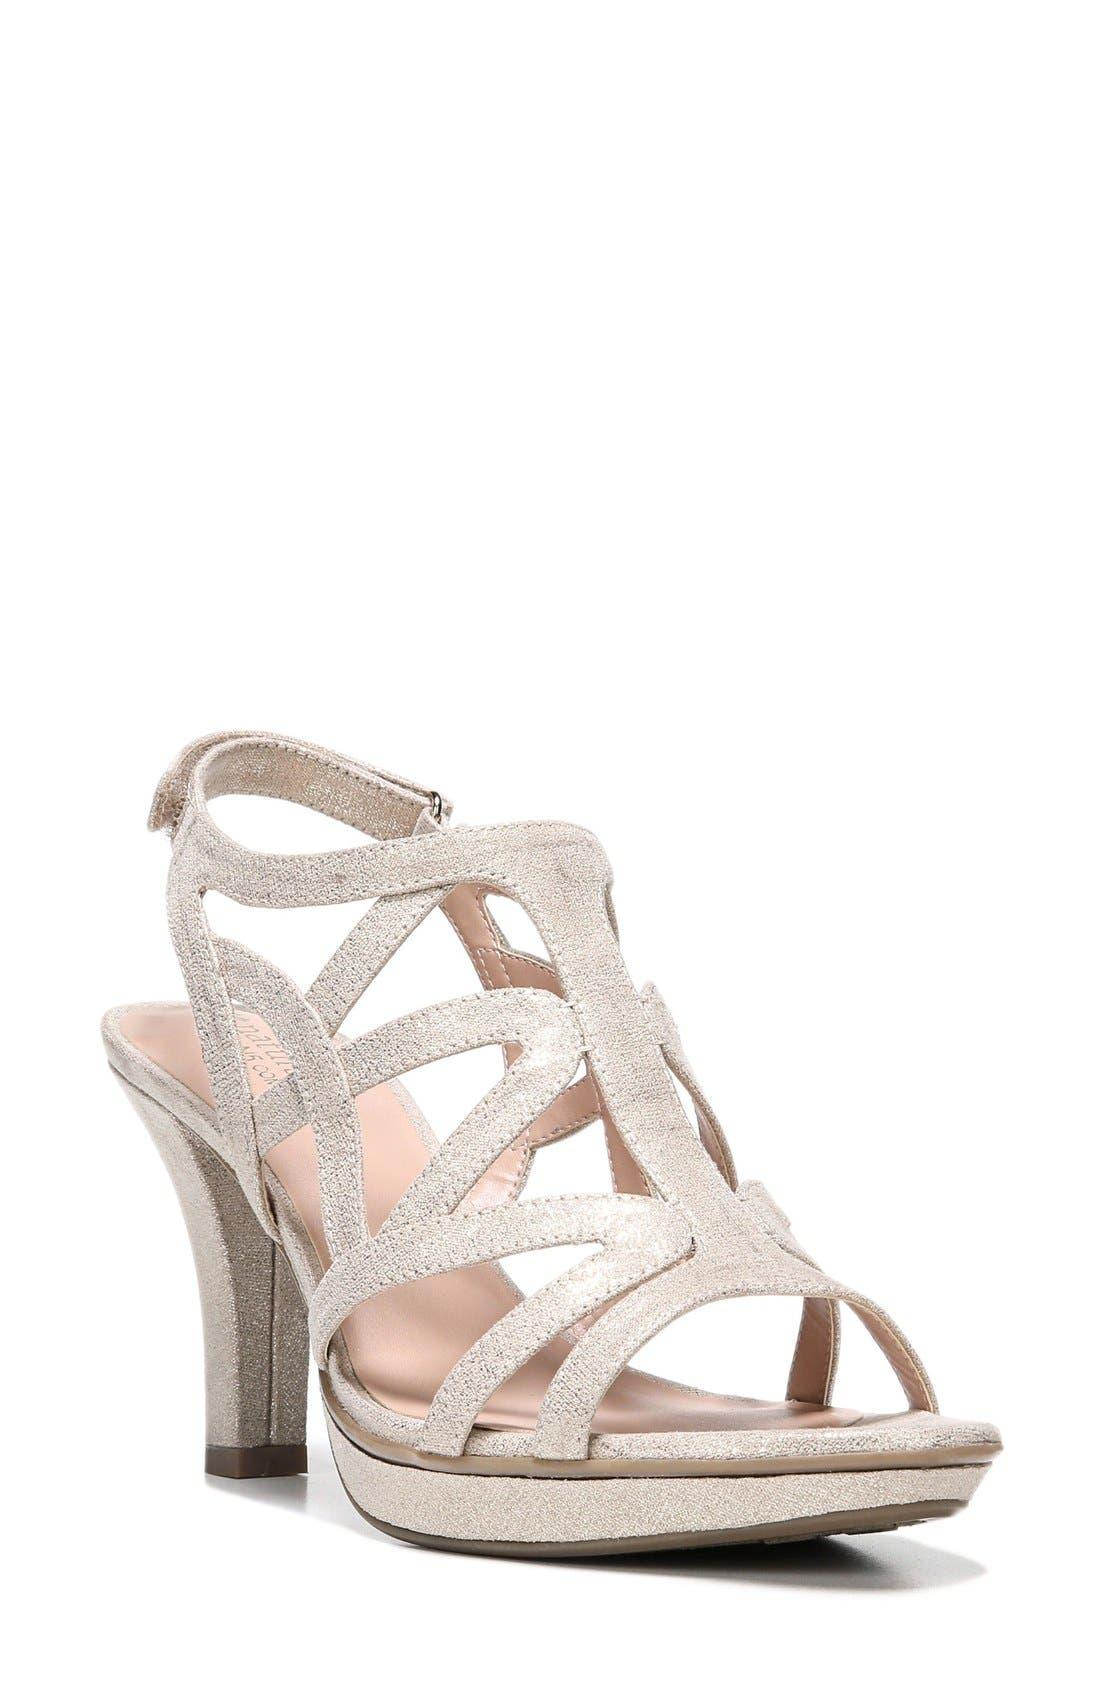 859e4c26cfa Naturalizer Sandals - Women s